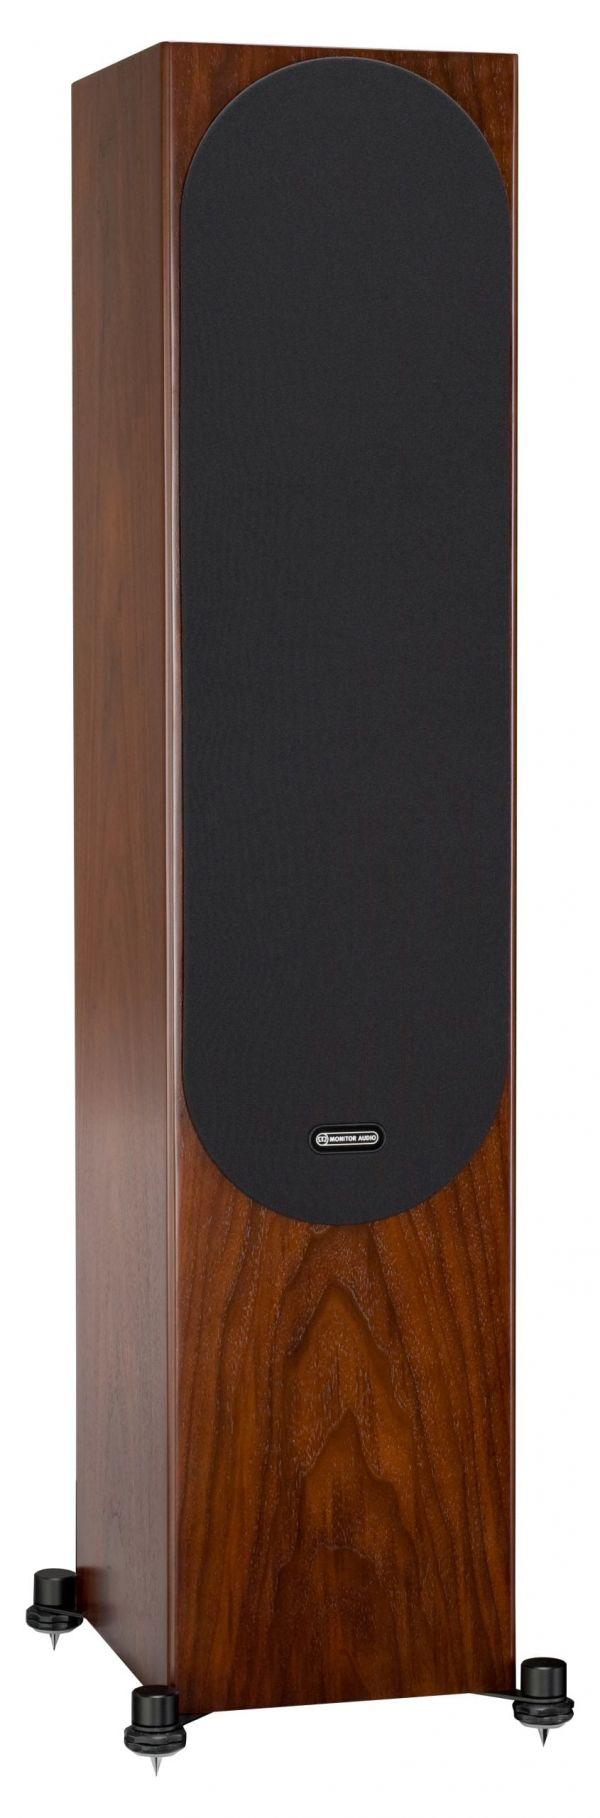 Monitor Audio Silver 500 Iso Walnut Gr scaled